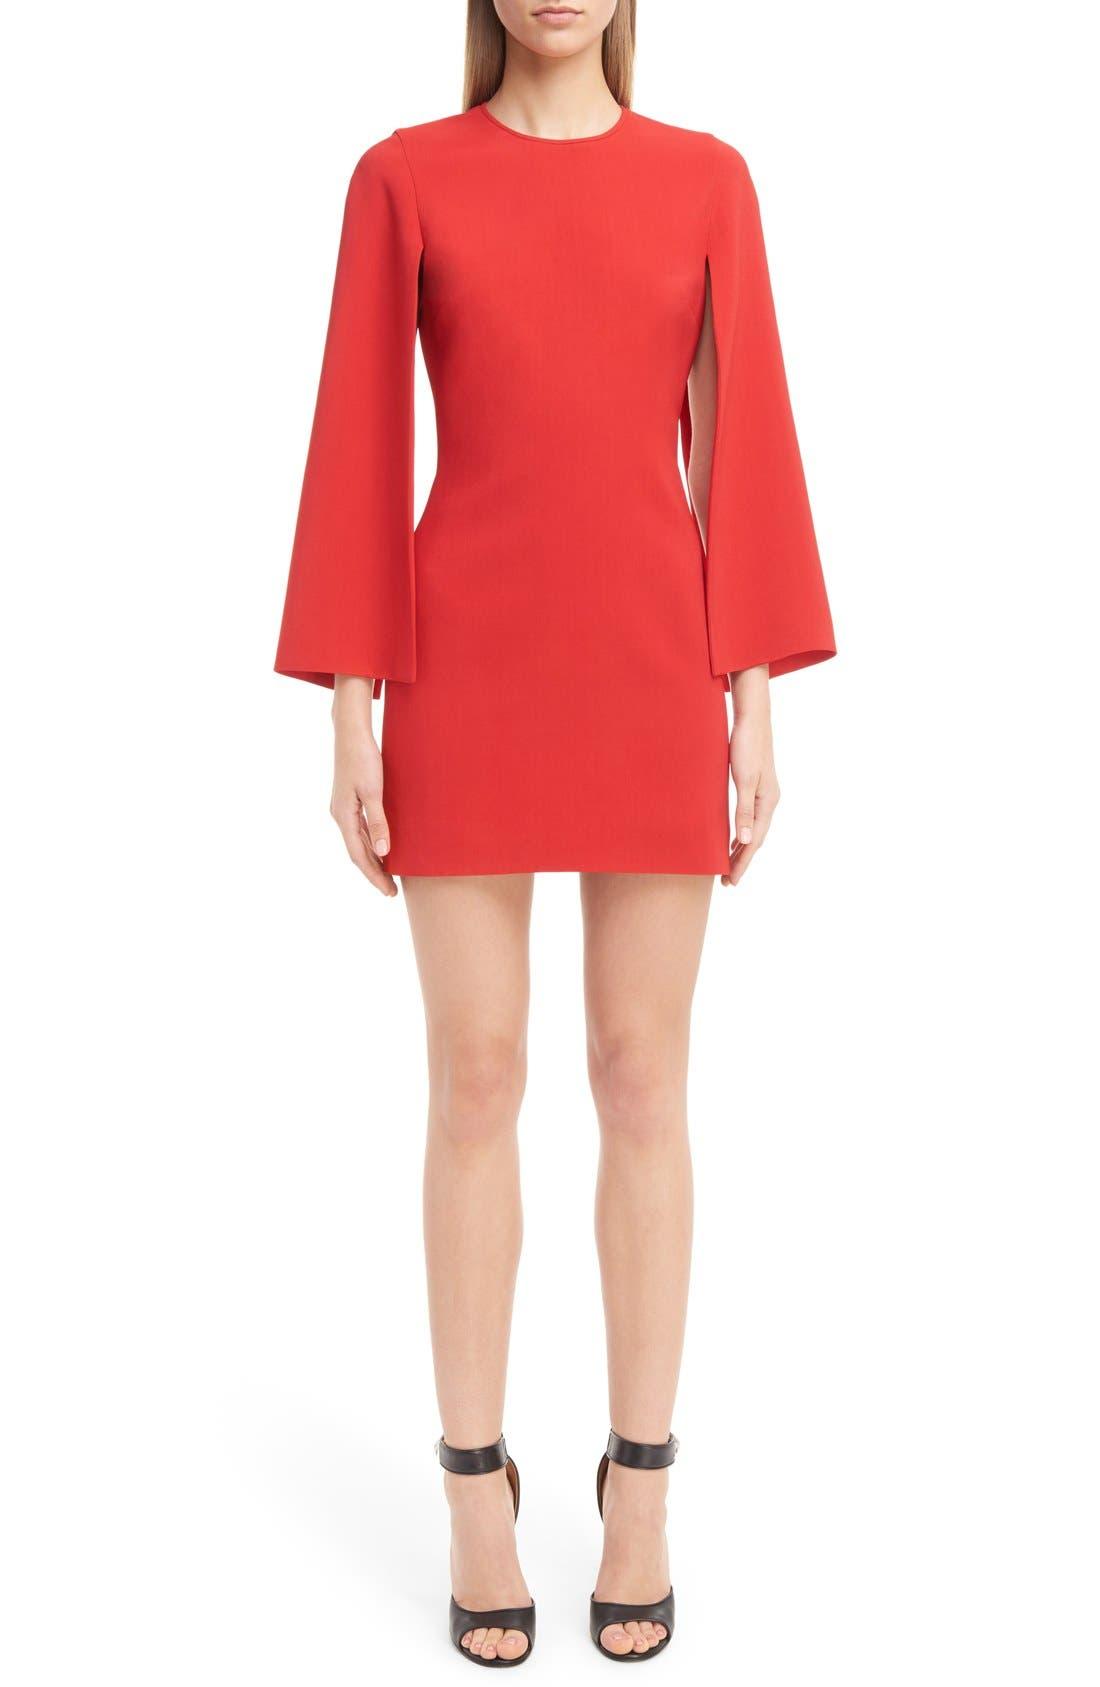 GIVENCHY,                             Cape Sleeve Dress,                             Main thumbnail 1, color,                             600